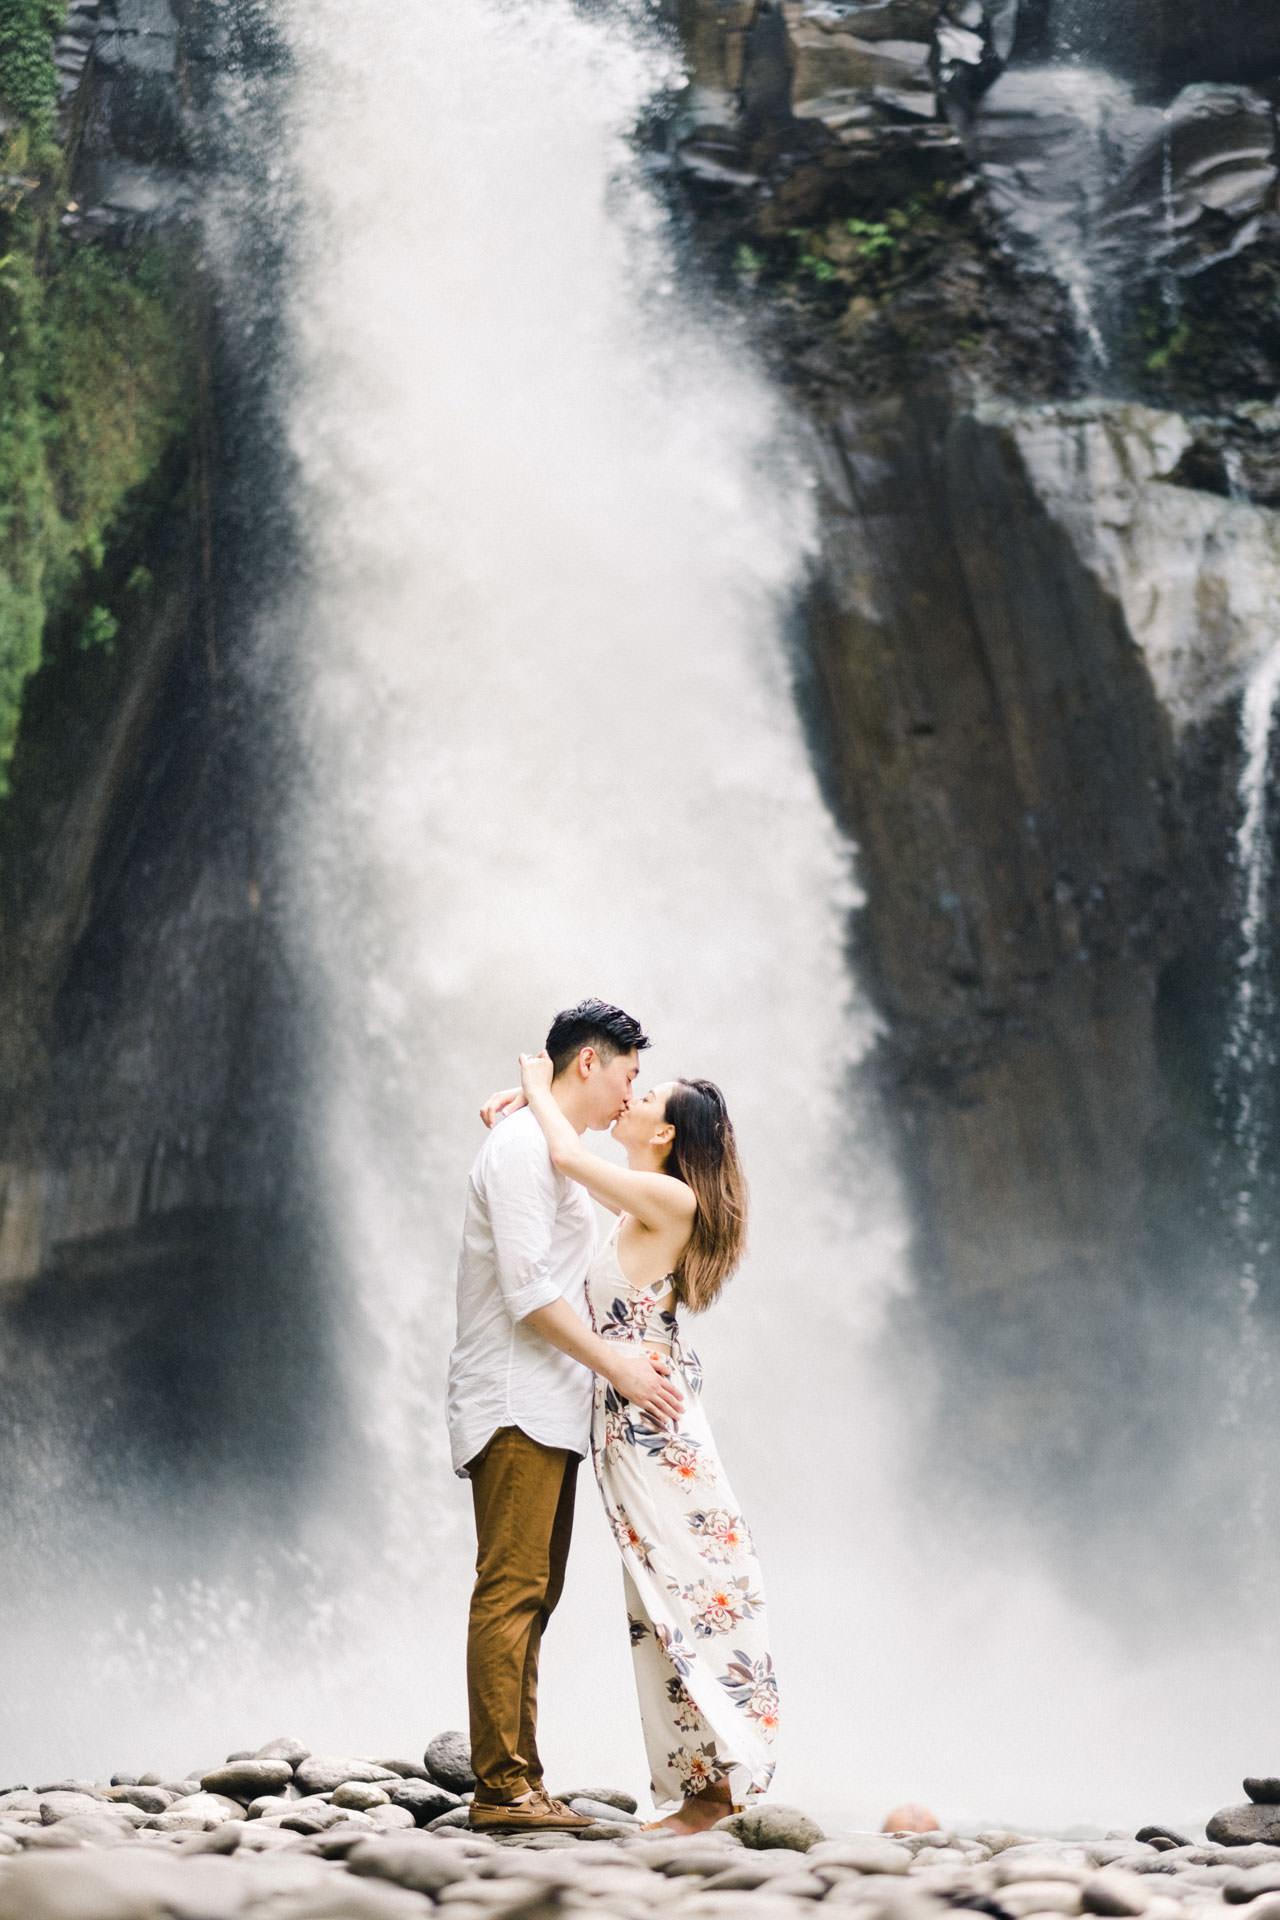 Adventurous Waterfall Surprise Proposal - Bali Vacation Proposal Ideas 24